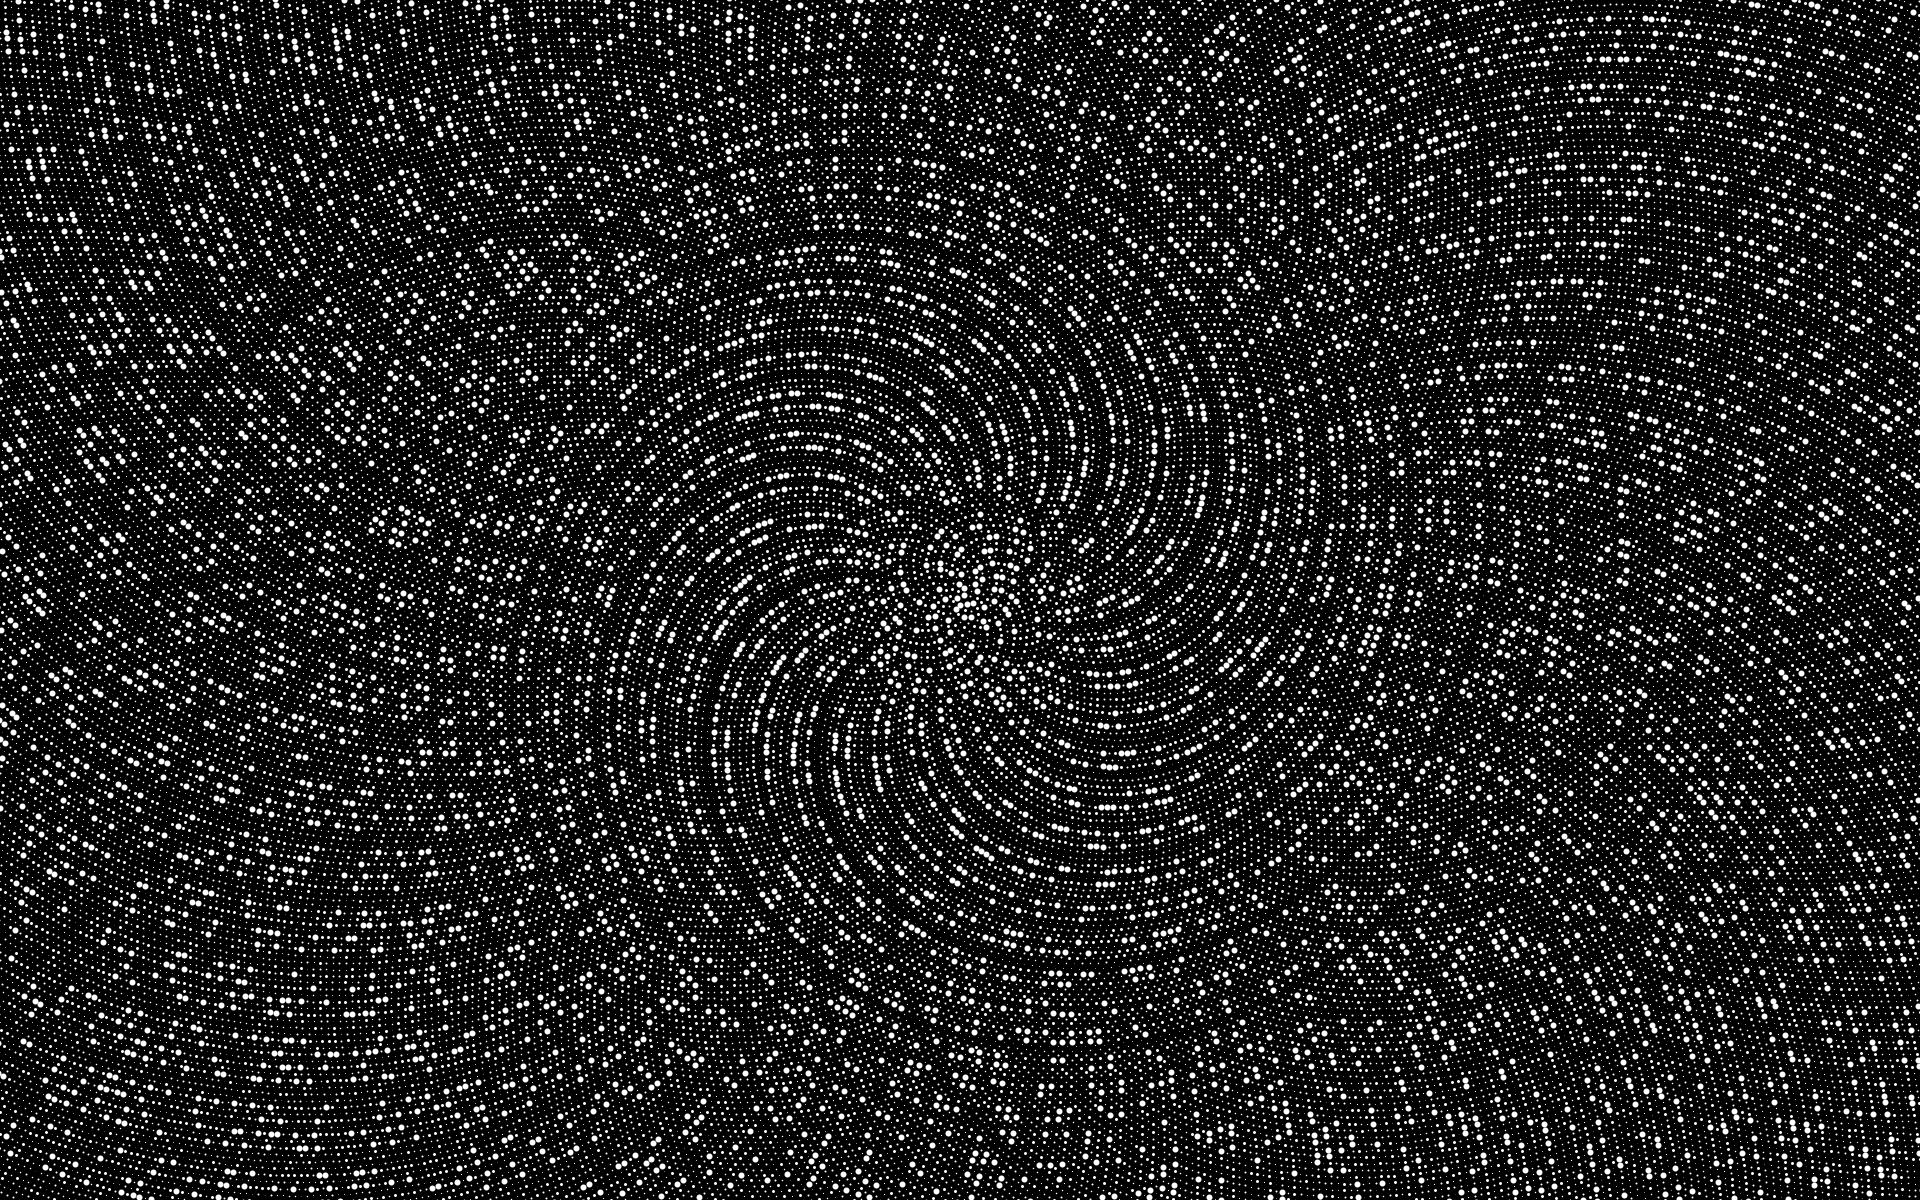 getImageAttachment?filename=spiral-wolfram.png&userId=125023